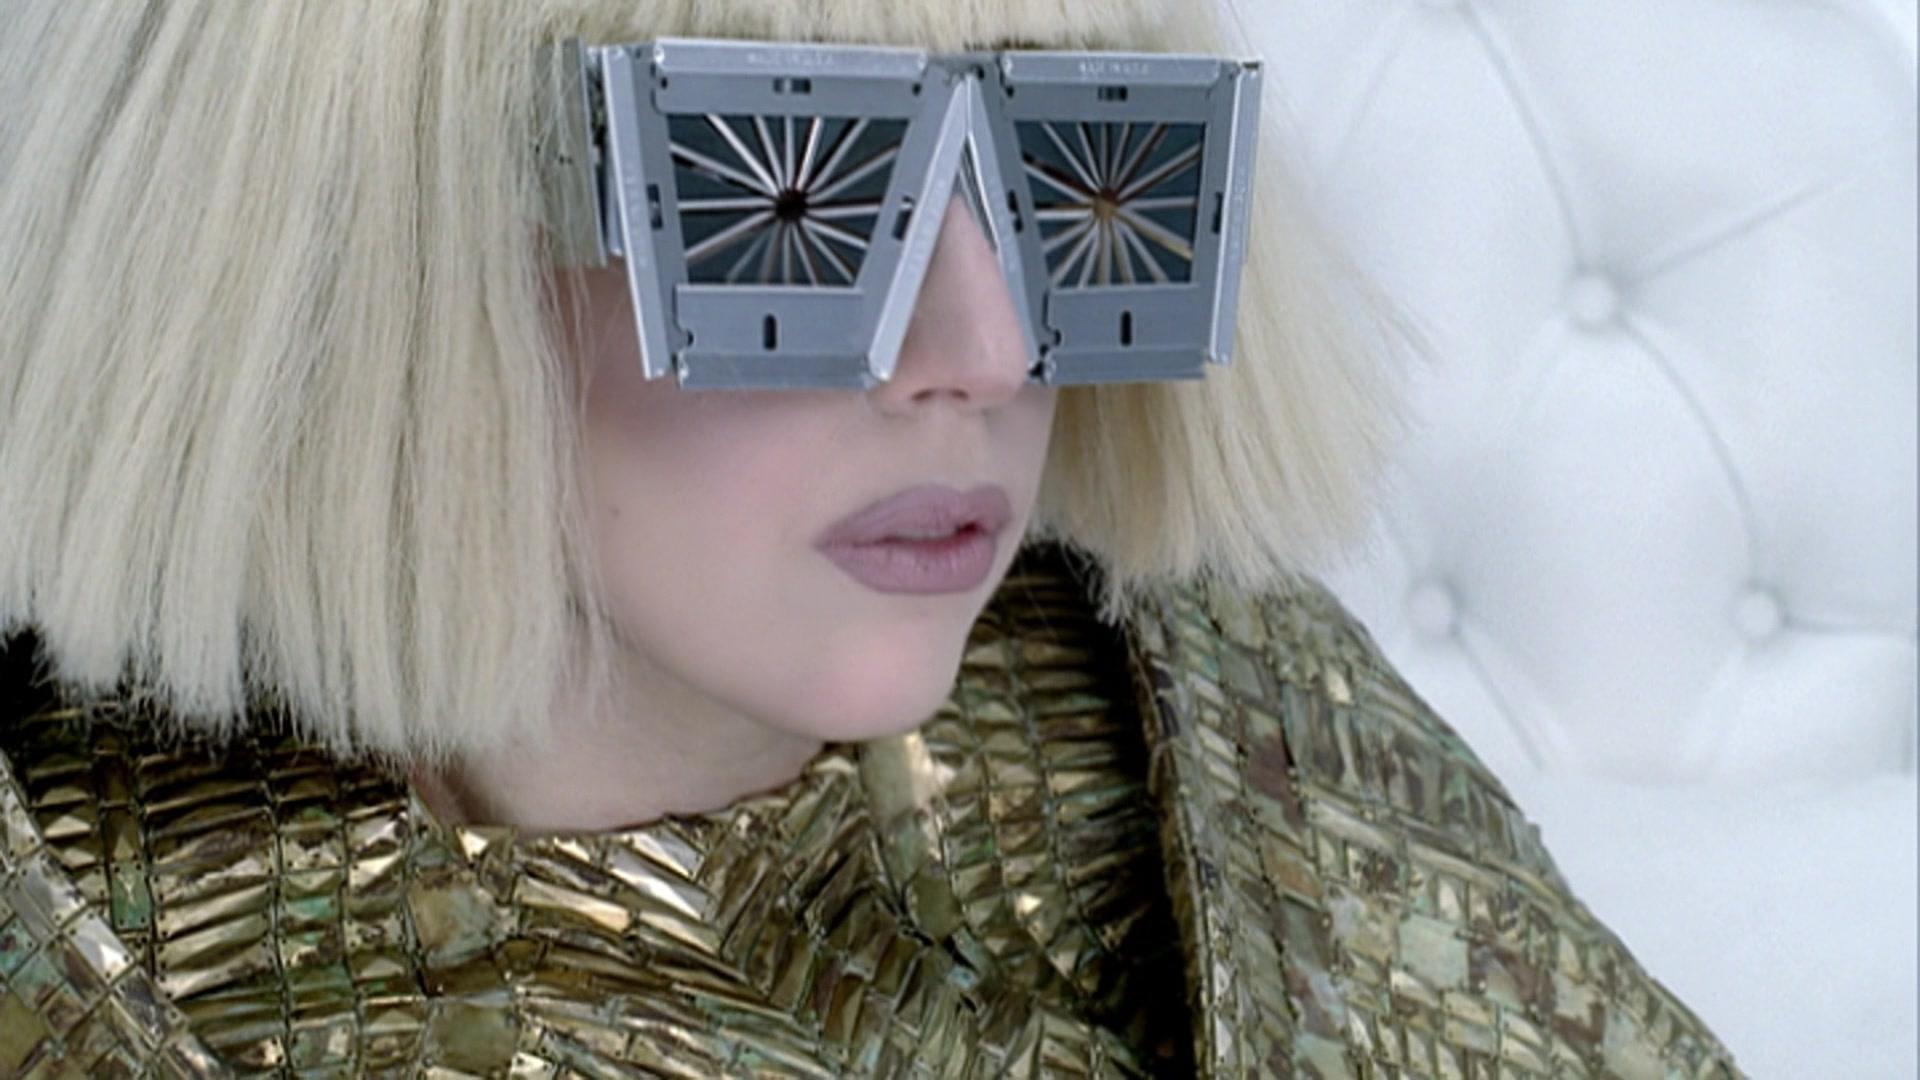 File:Lady Gaga - Bad Romance 003.jpg